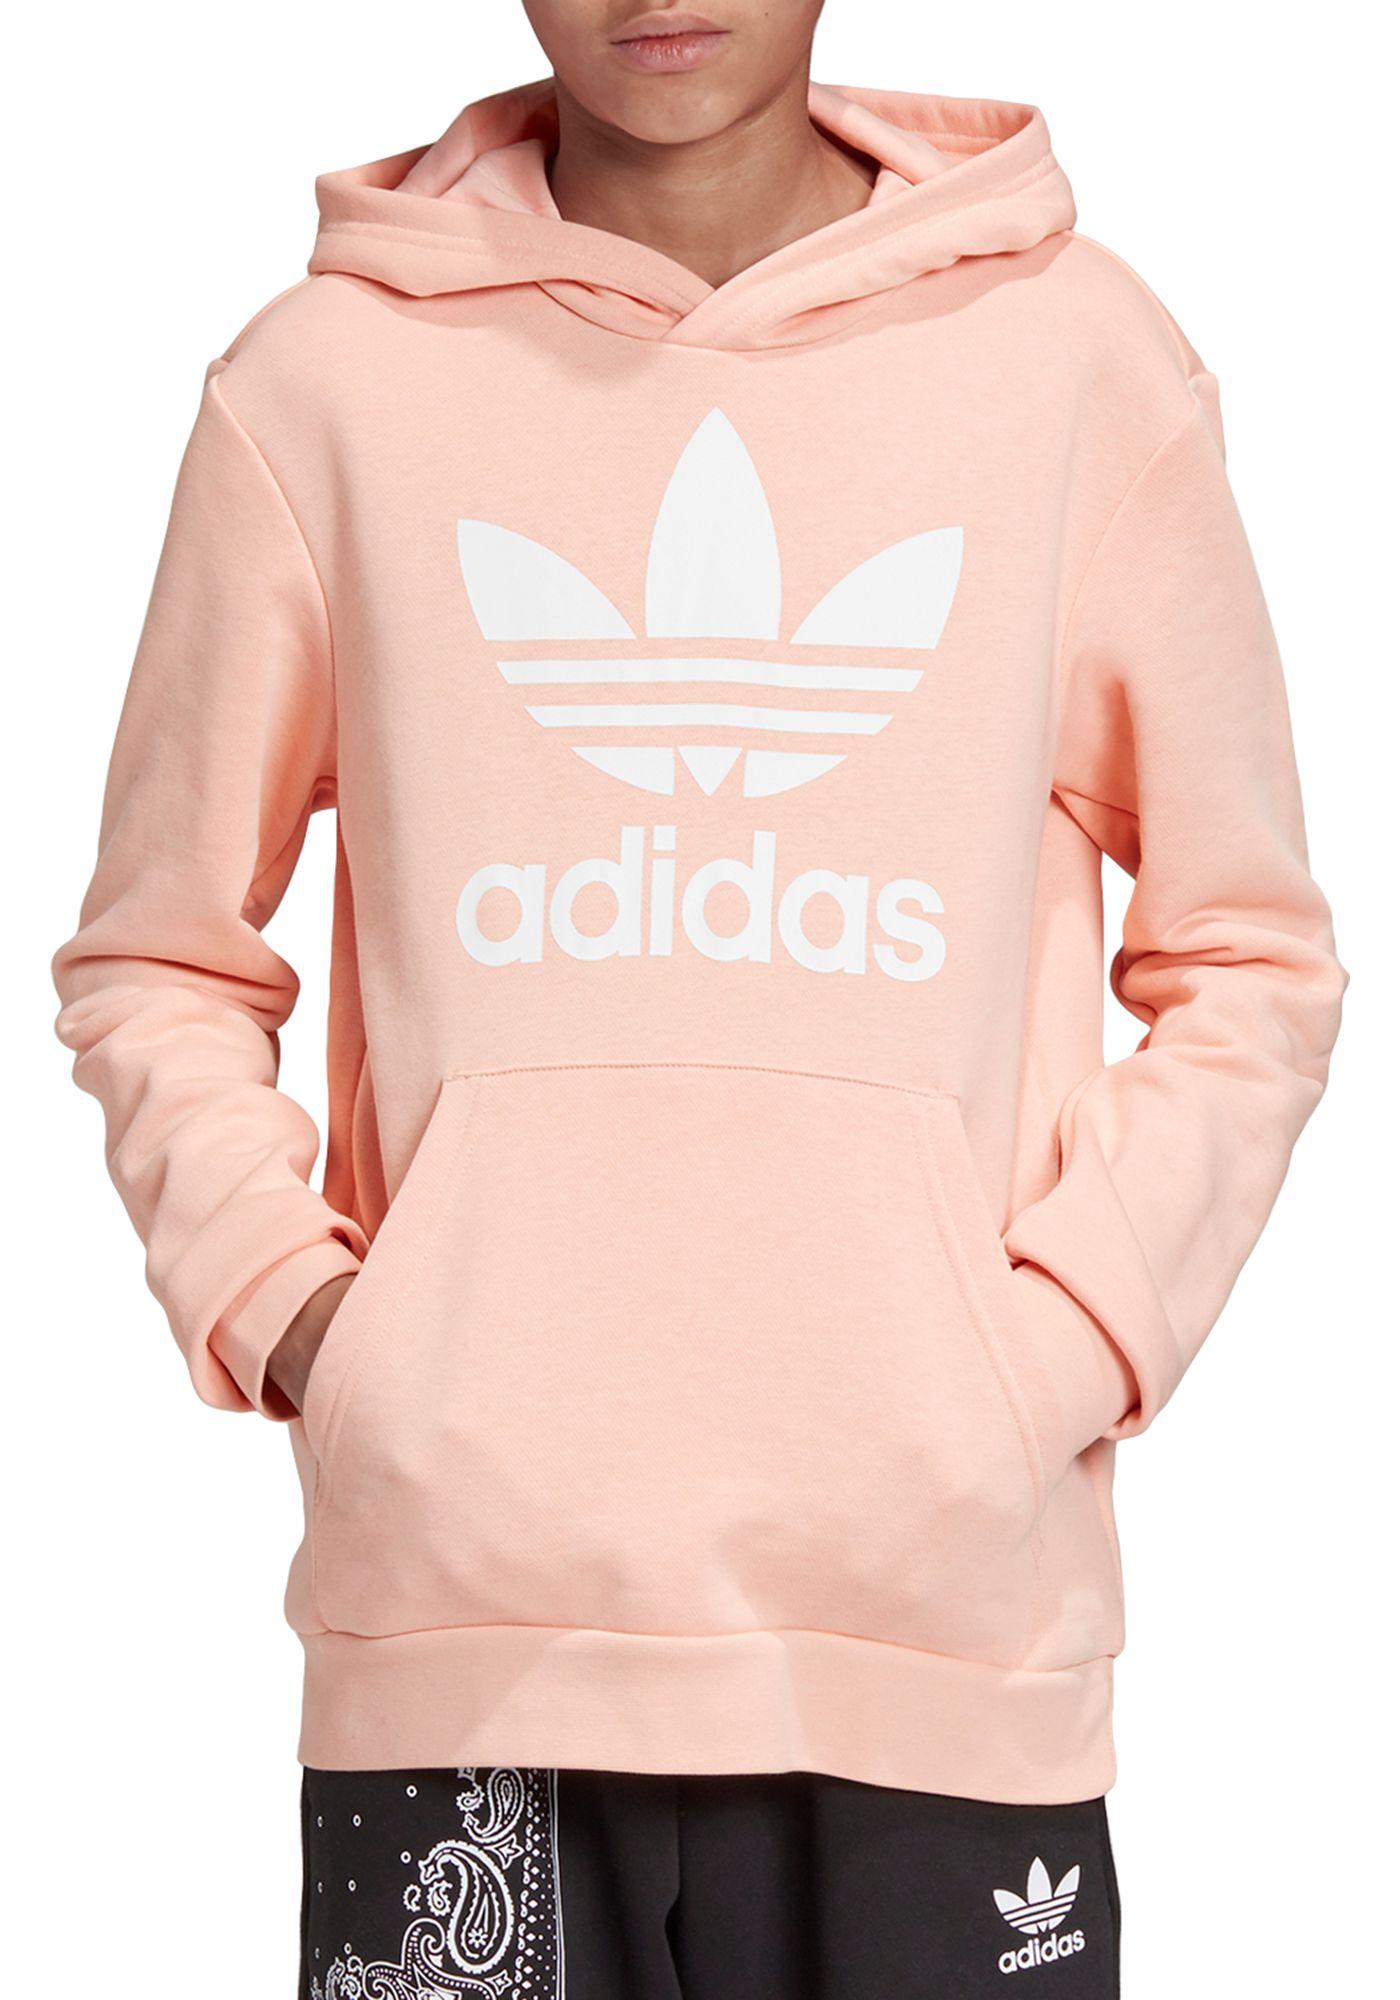 adidas Originals Girls' Trefoil Graphic Hoodie